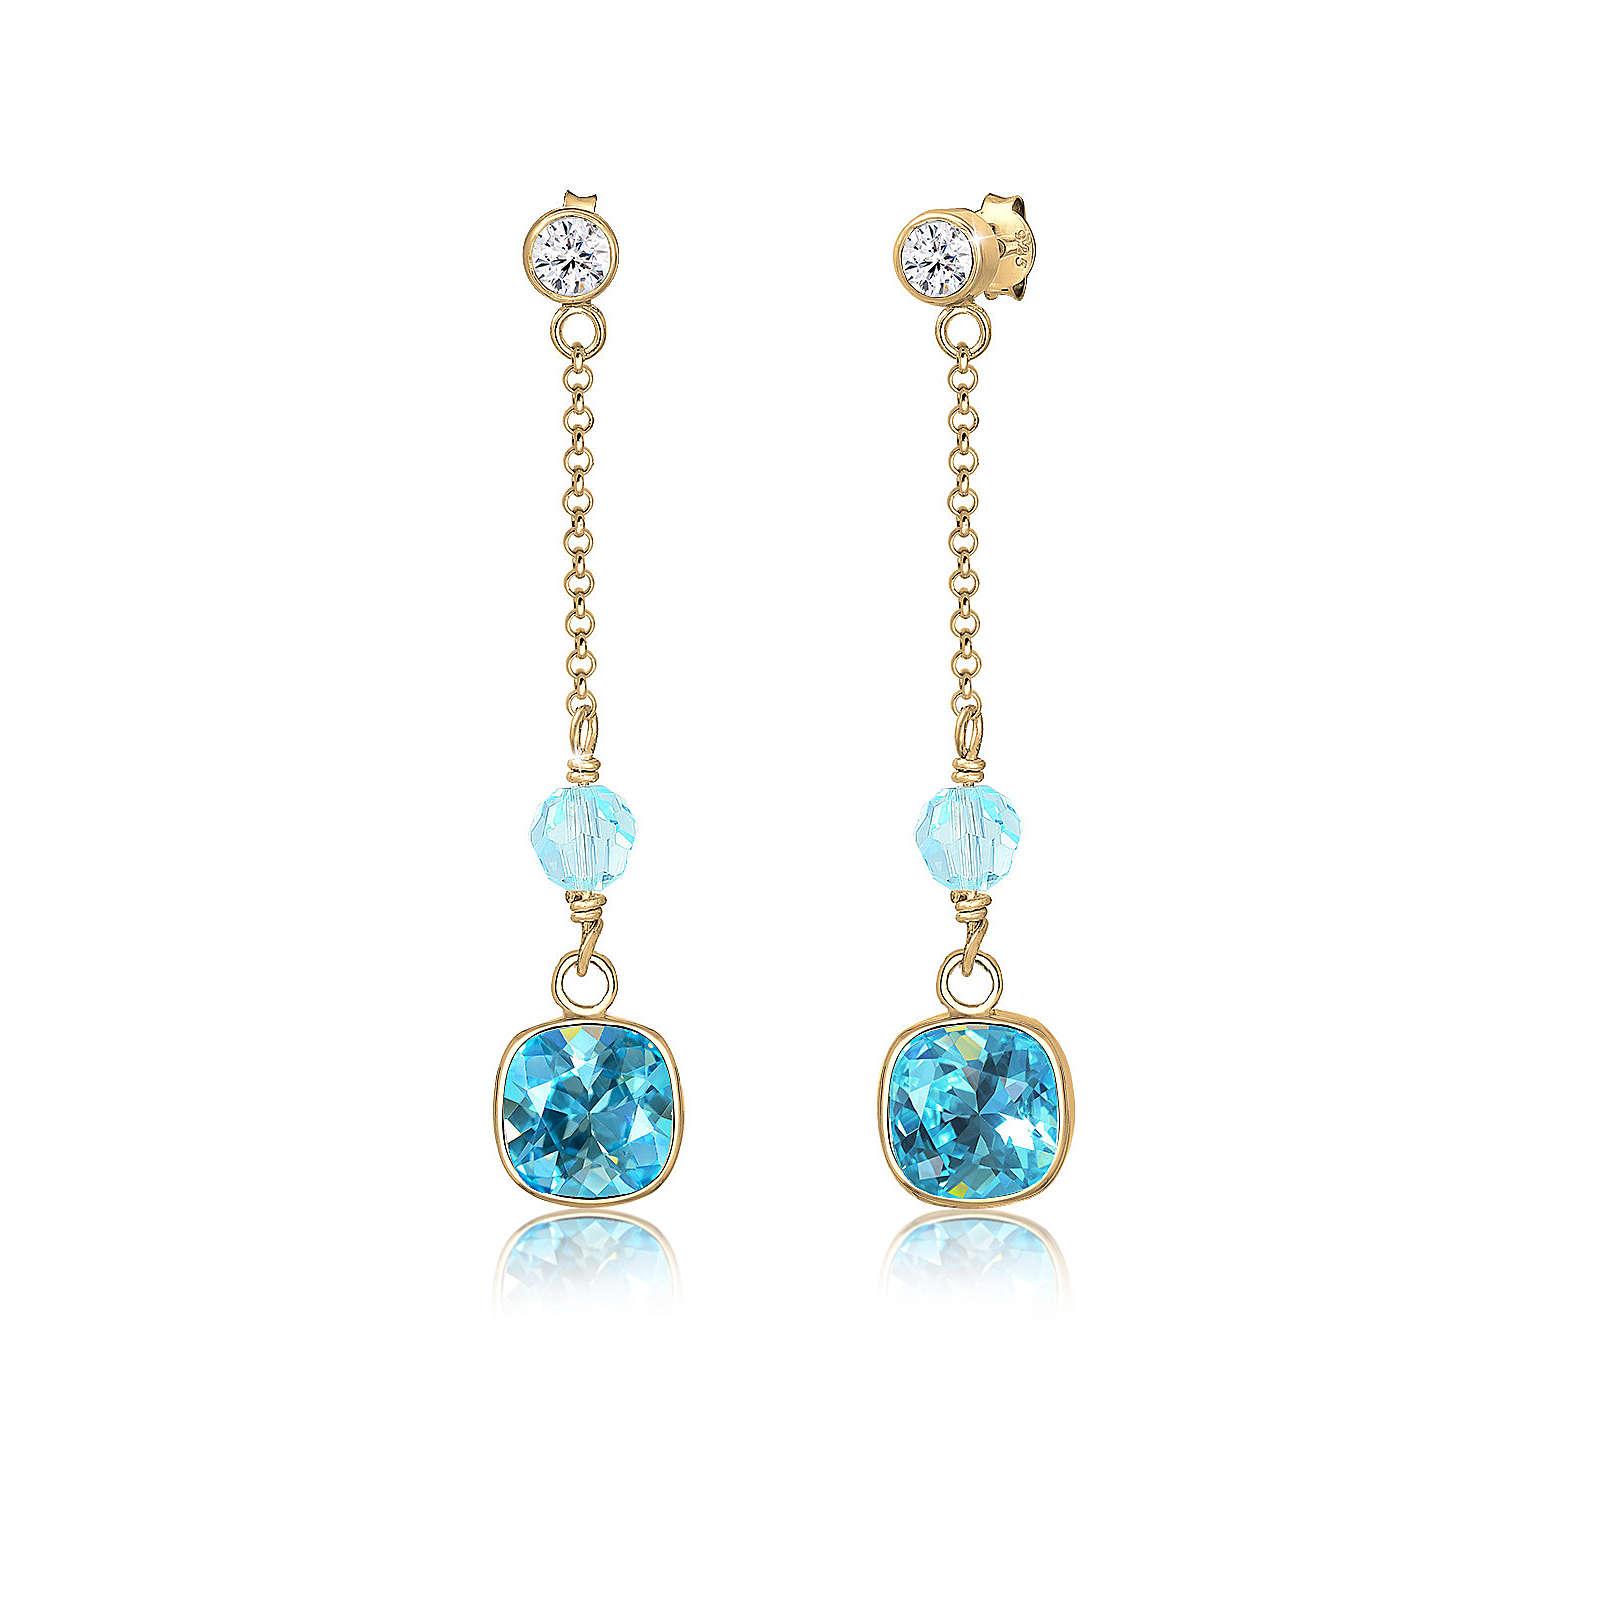 Elli PREMIUM Ohrringe Hänger Swarovski® Kristalle 925 Sterling Silber Ohrringe gold Damen Gr. one size